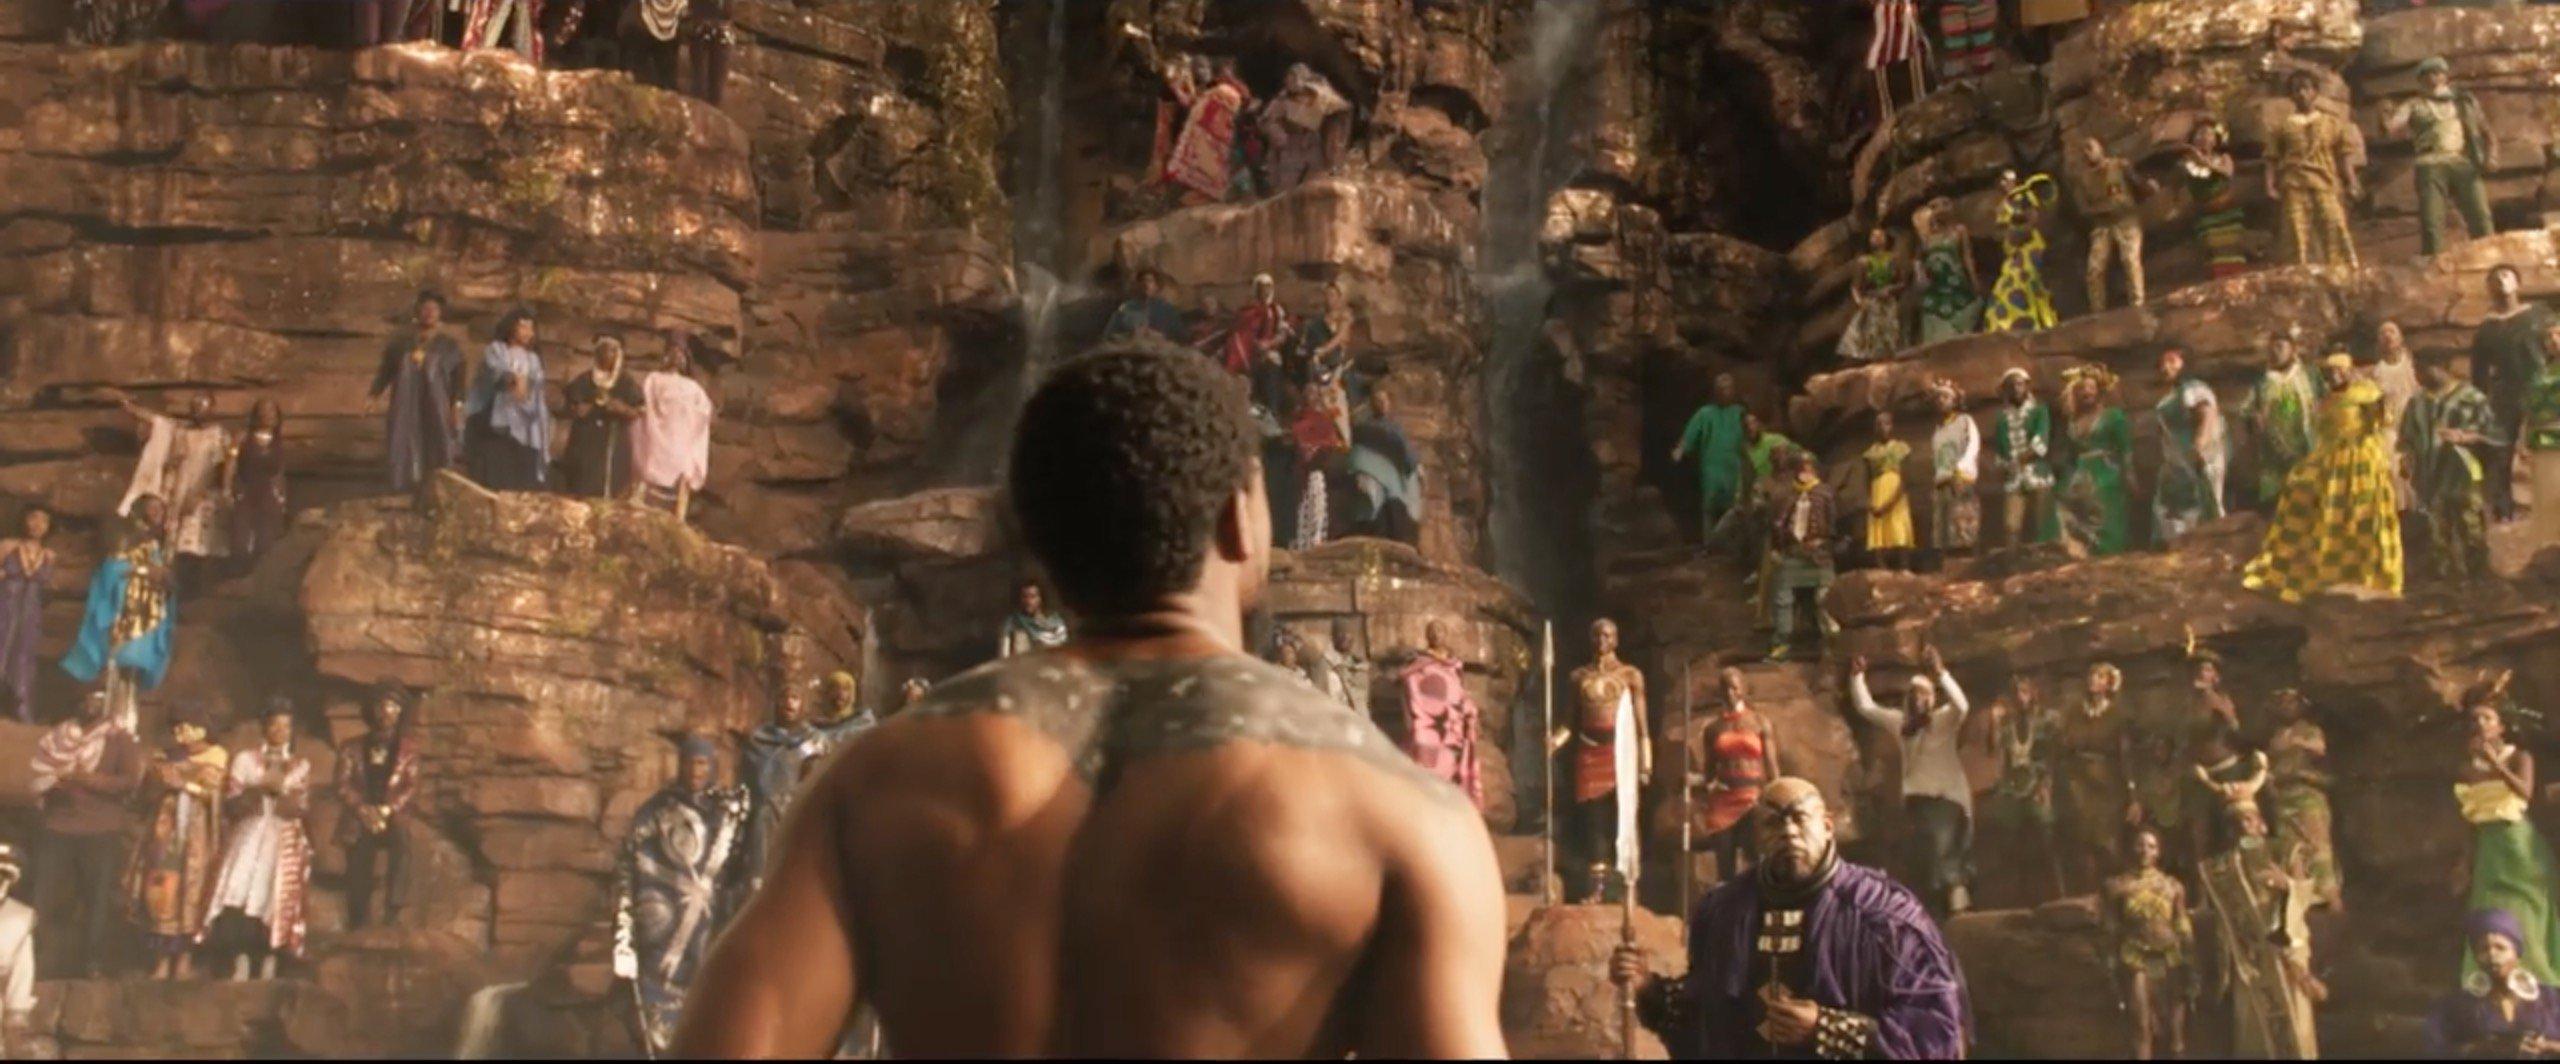 Resultado de imagen para Black Panther pelicula wakanda